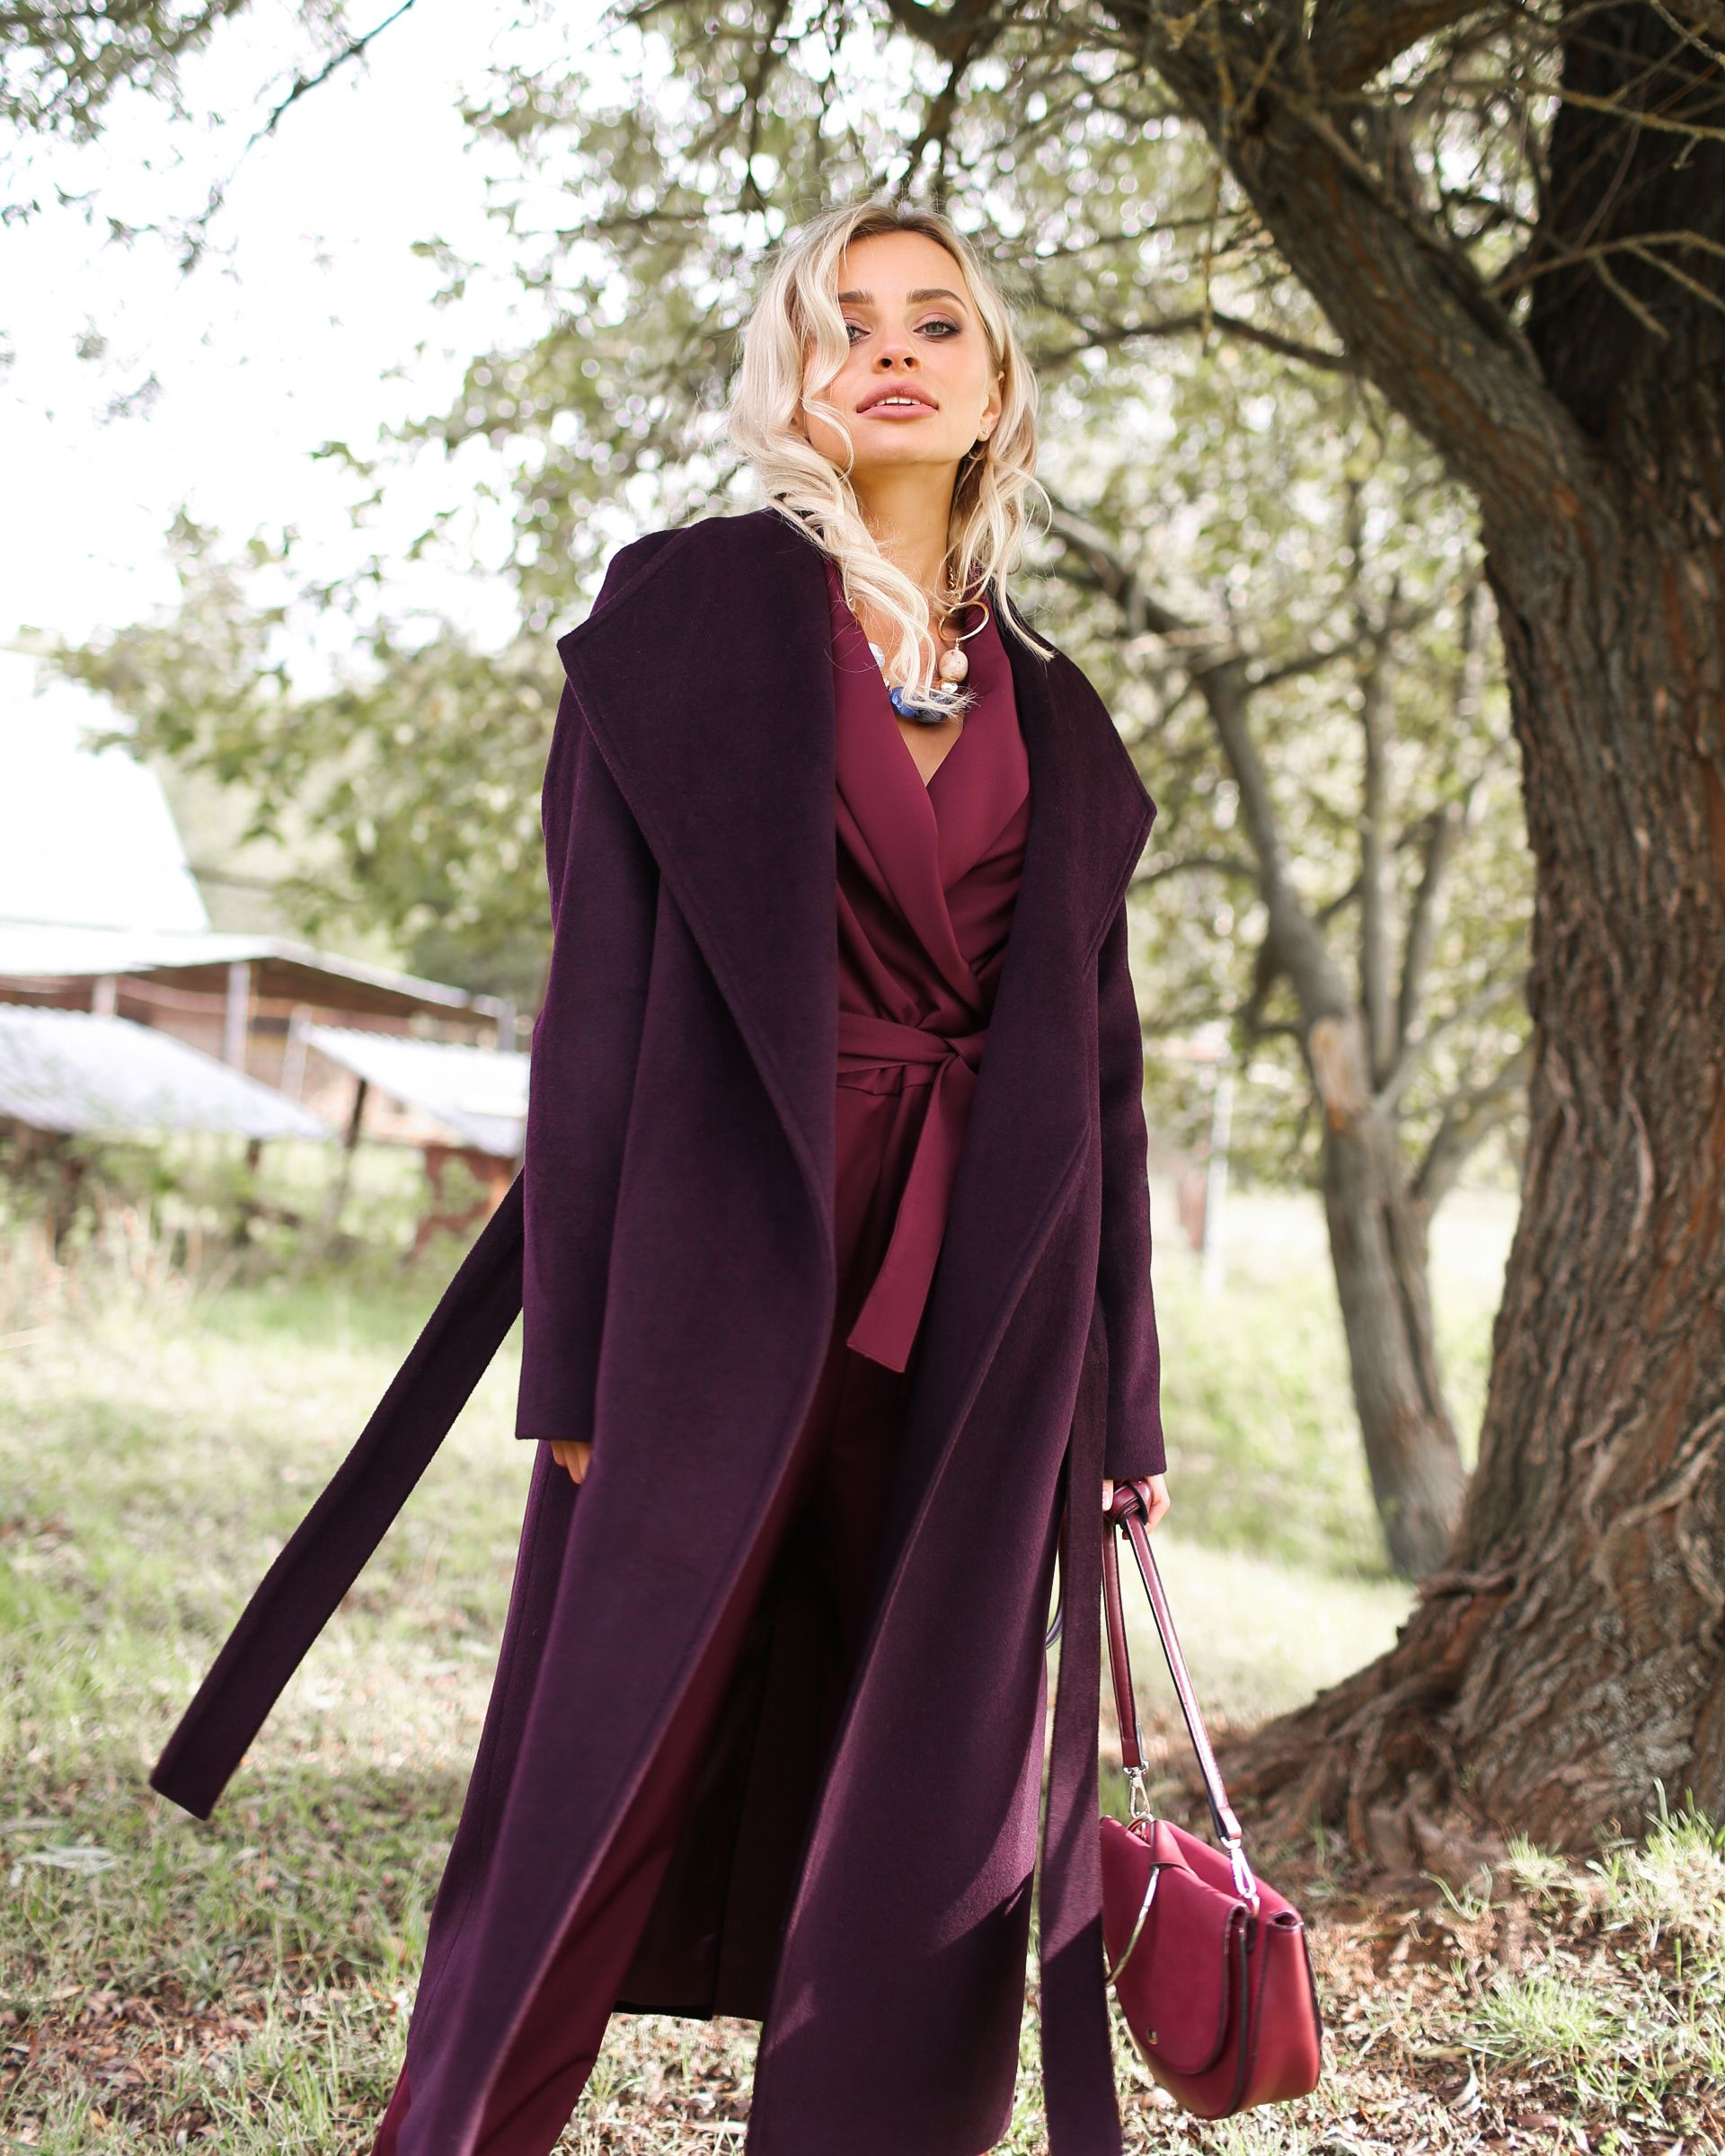 aa457224c97b фиолетовое пальто, фиолетовое пальто с чем носить, женское пальто, женское  пальто 2017,